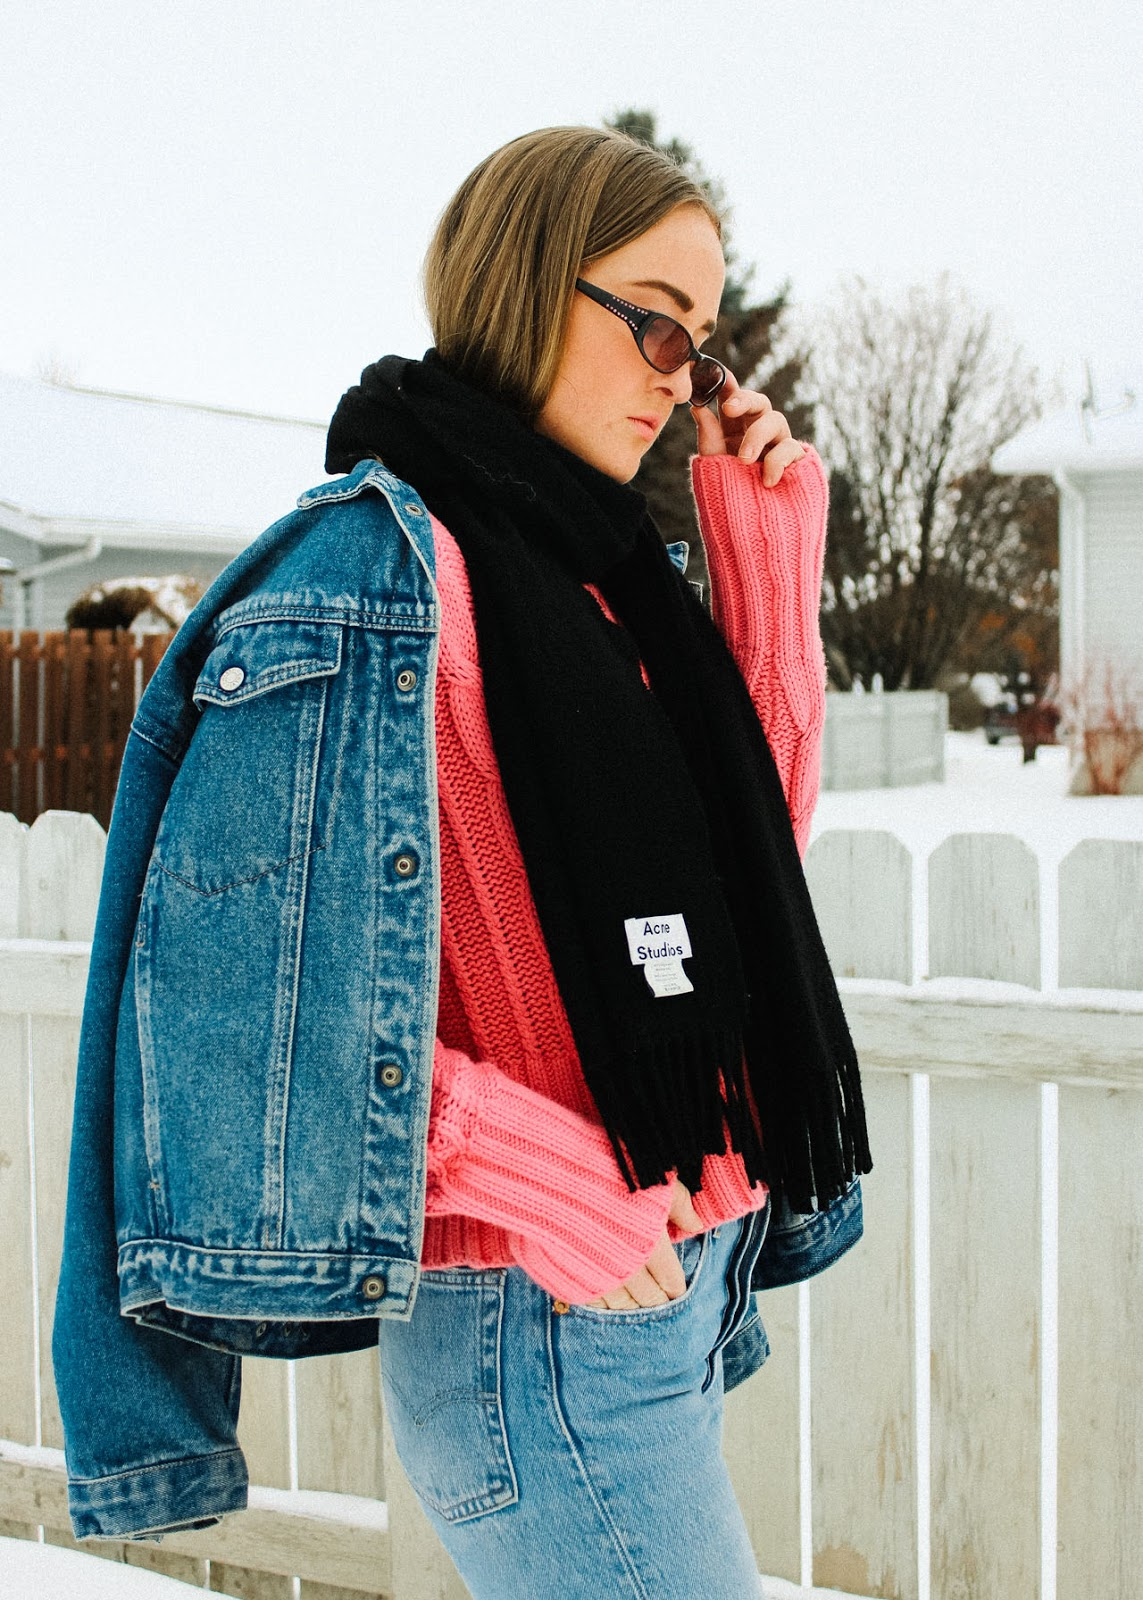 Acne Studios - Vintage Calvin Klein - Levi's - Winter Style - Outfit - Denim